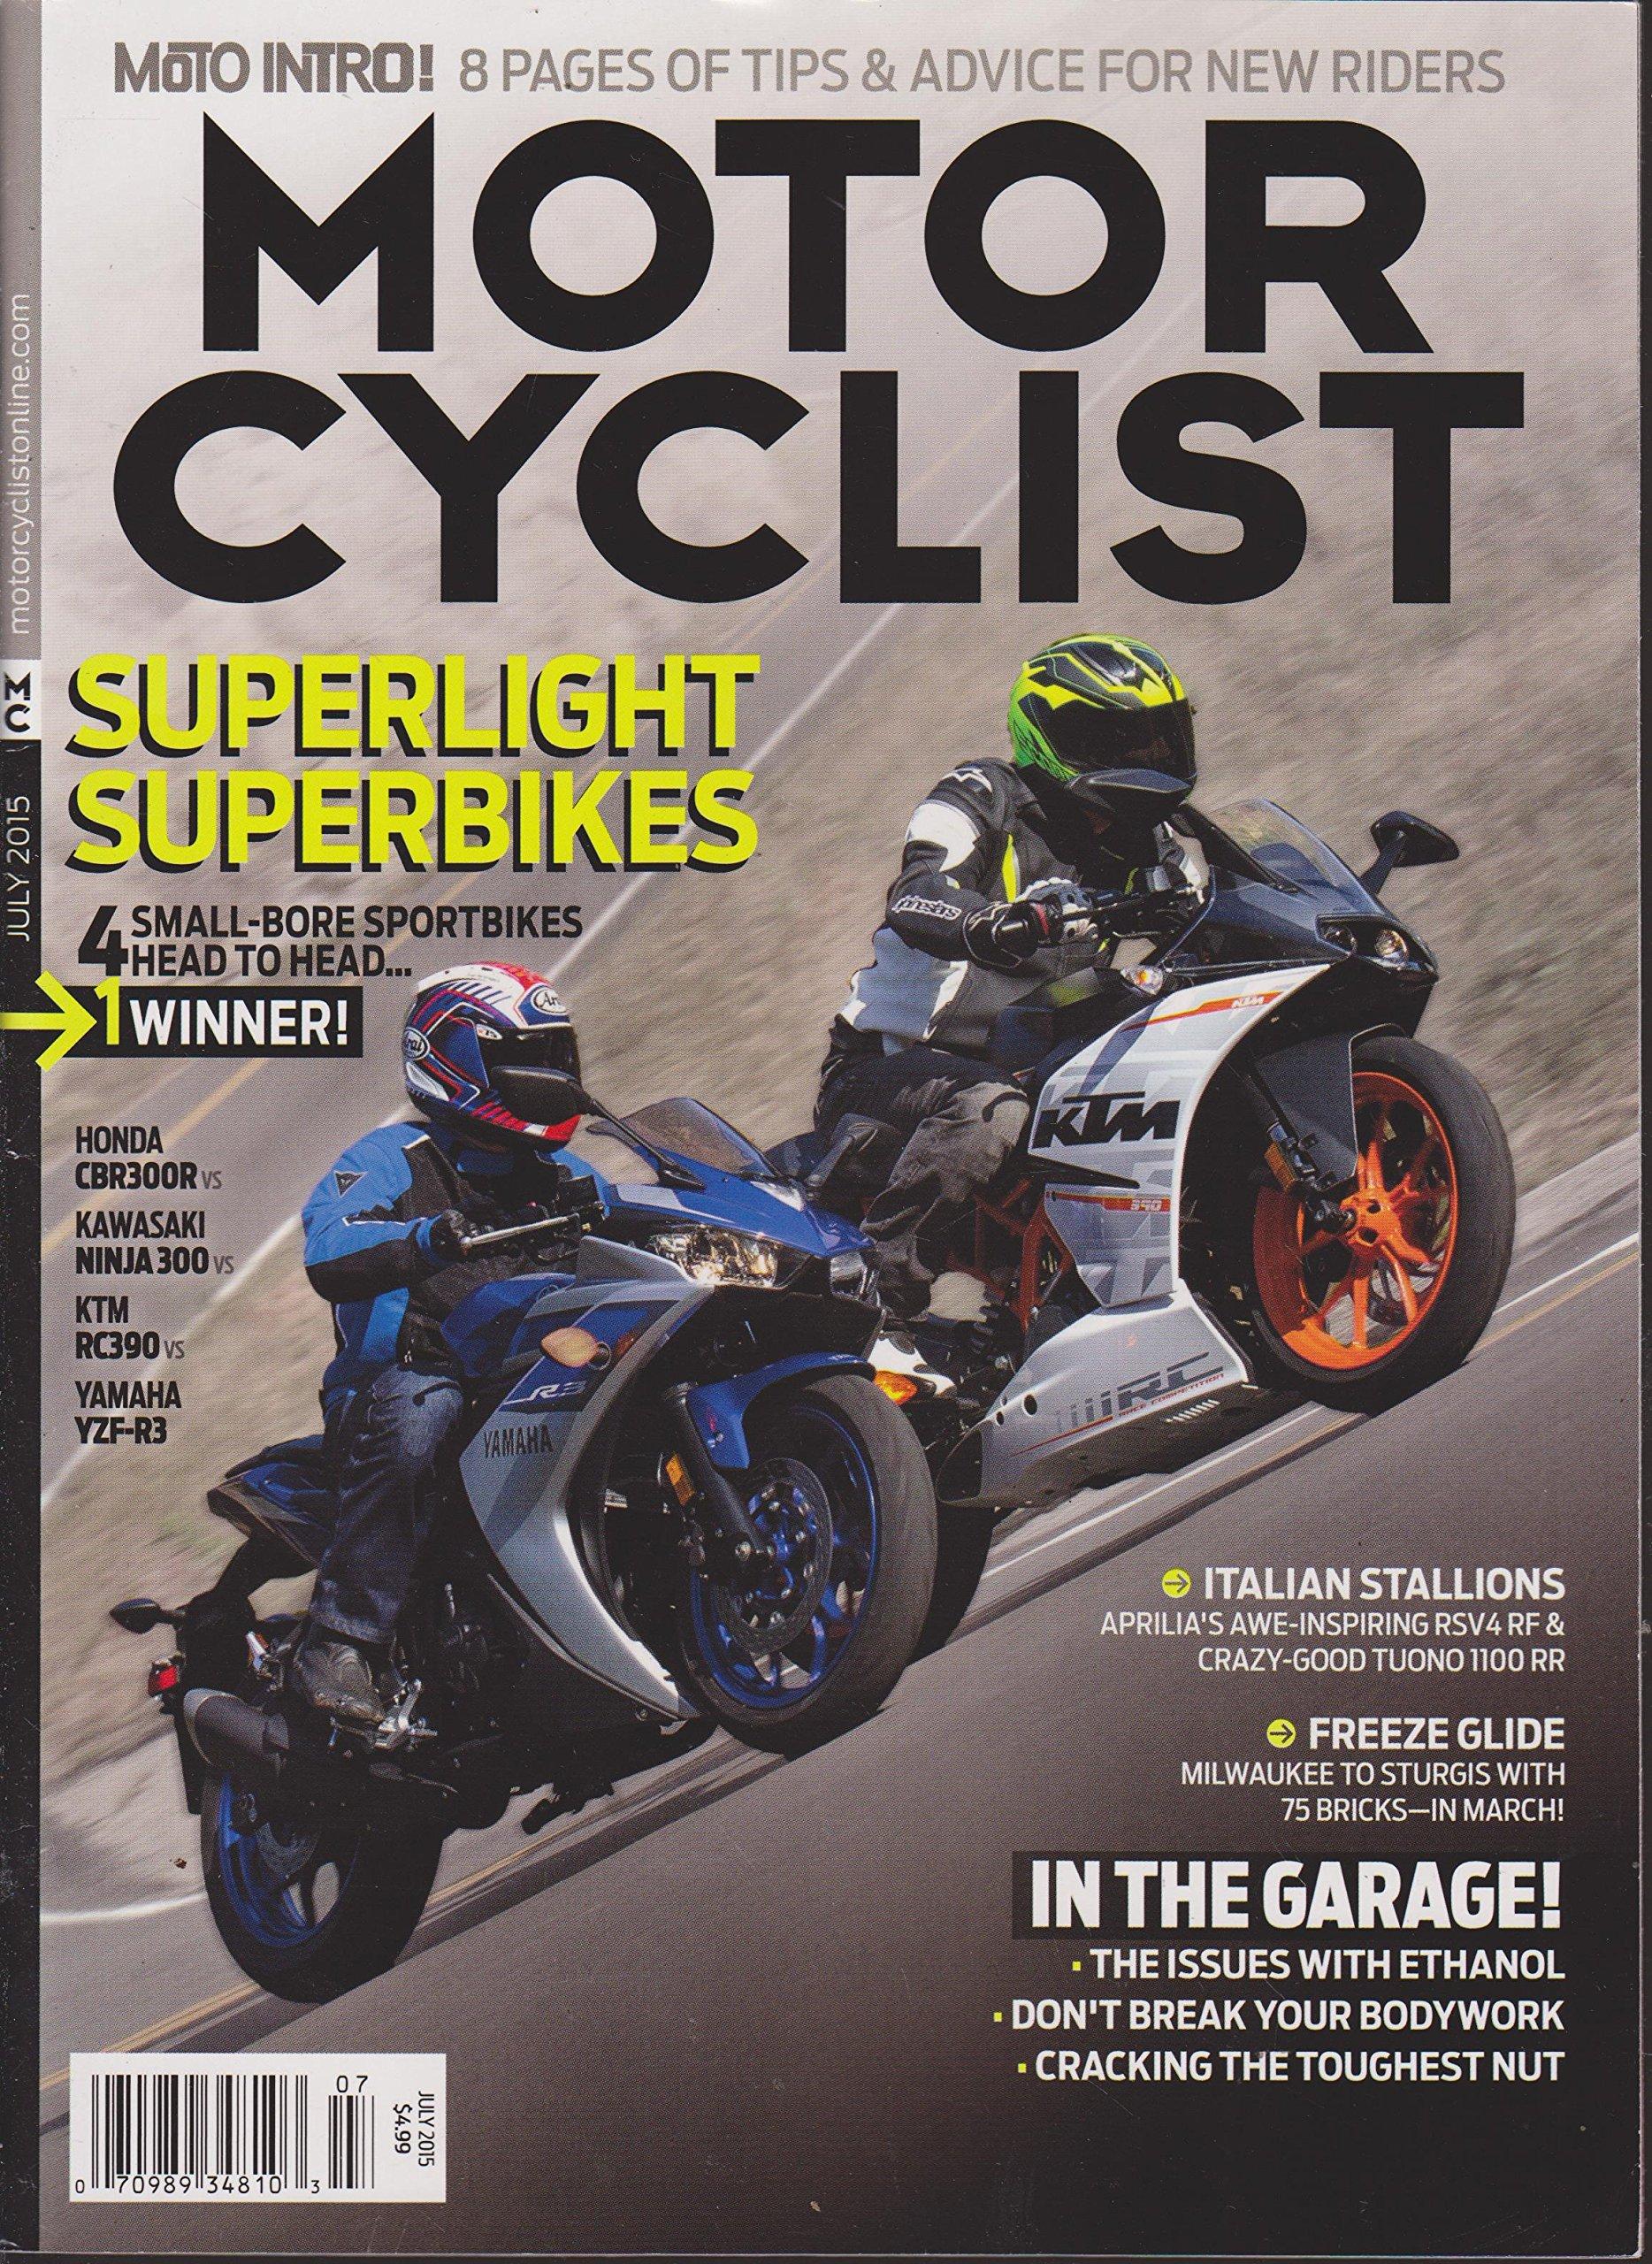 Motorcyclist Magazine July 2015: Amazon.com: Books